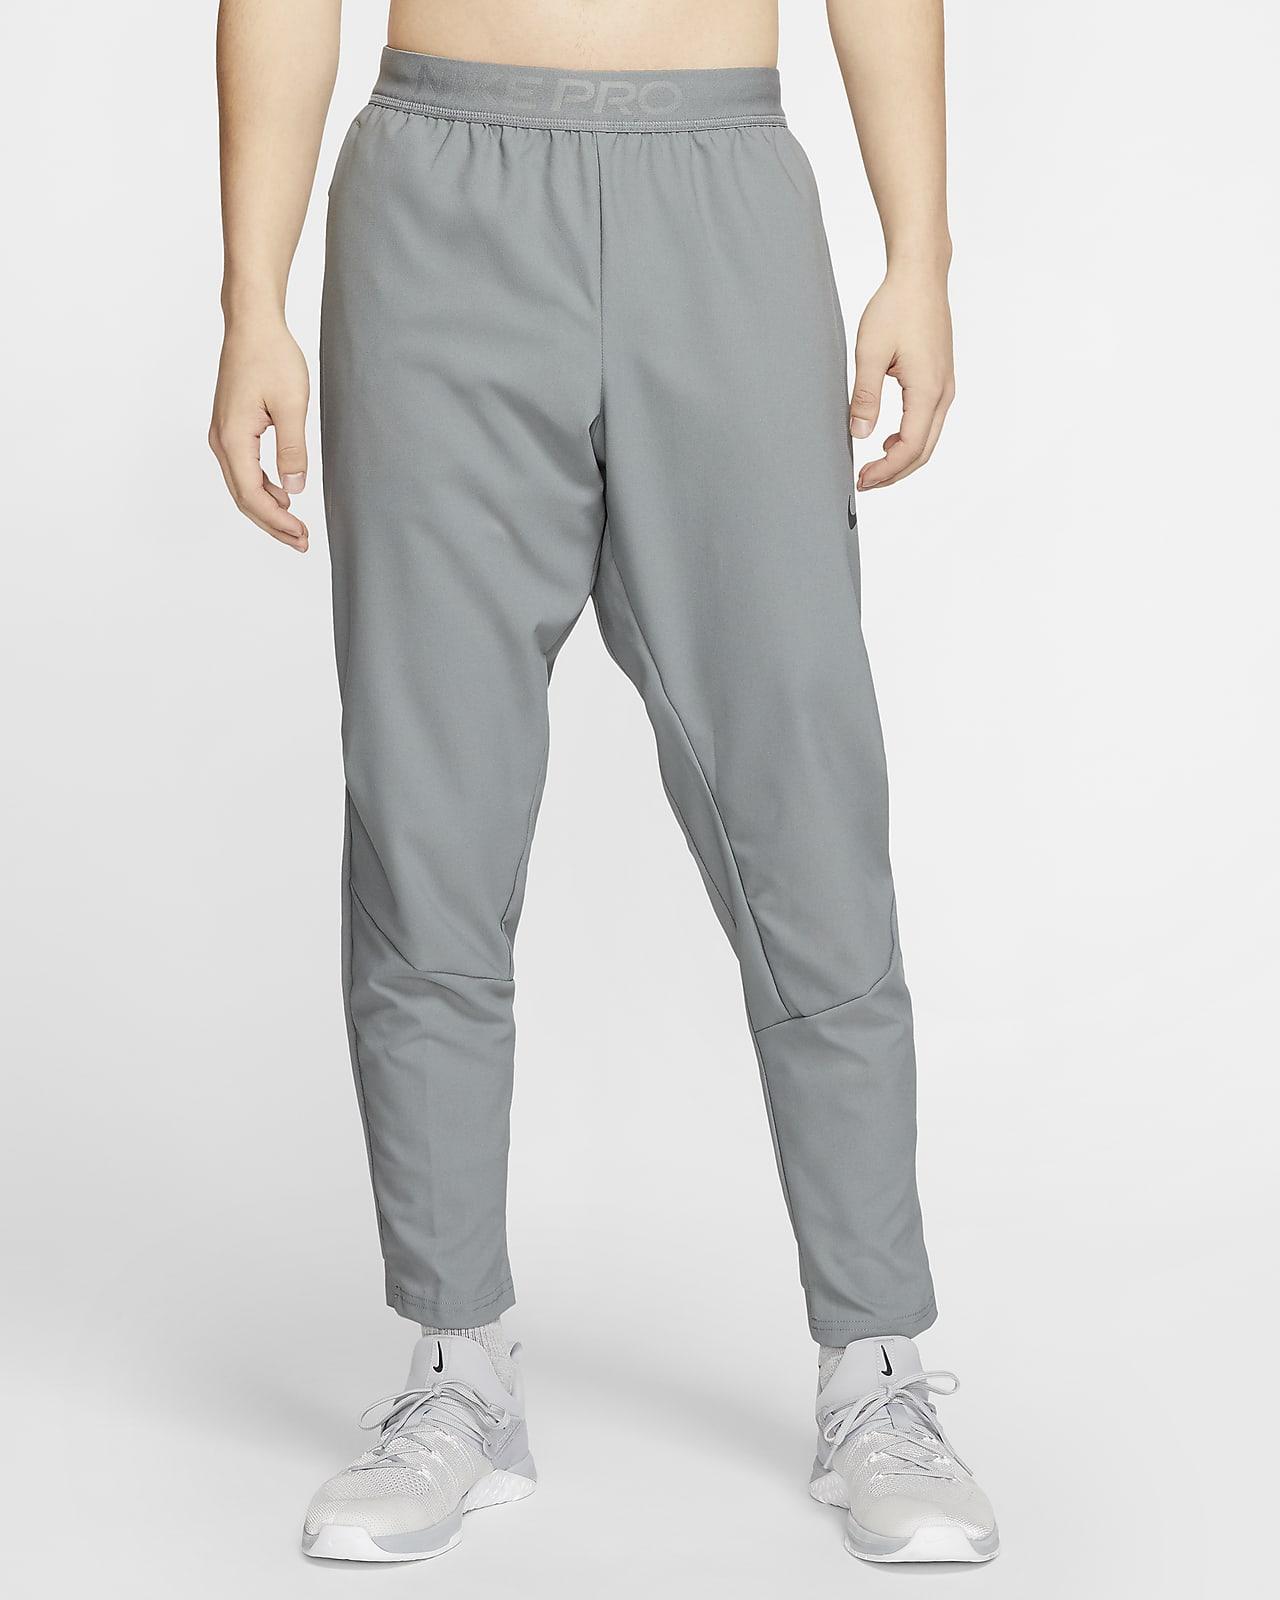 Nike Flex Men's Training Trousers